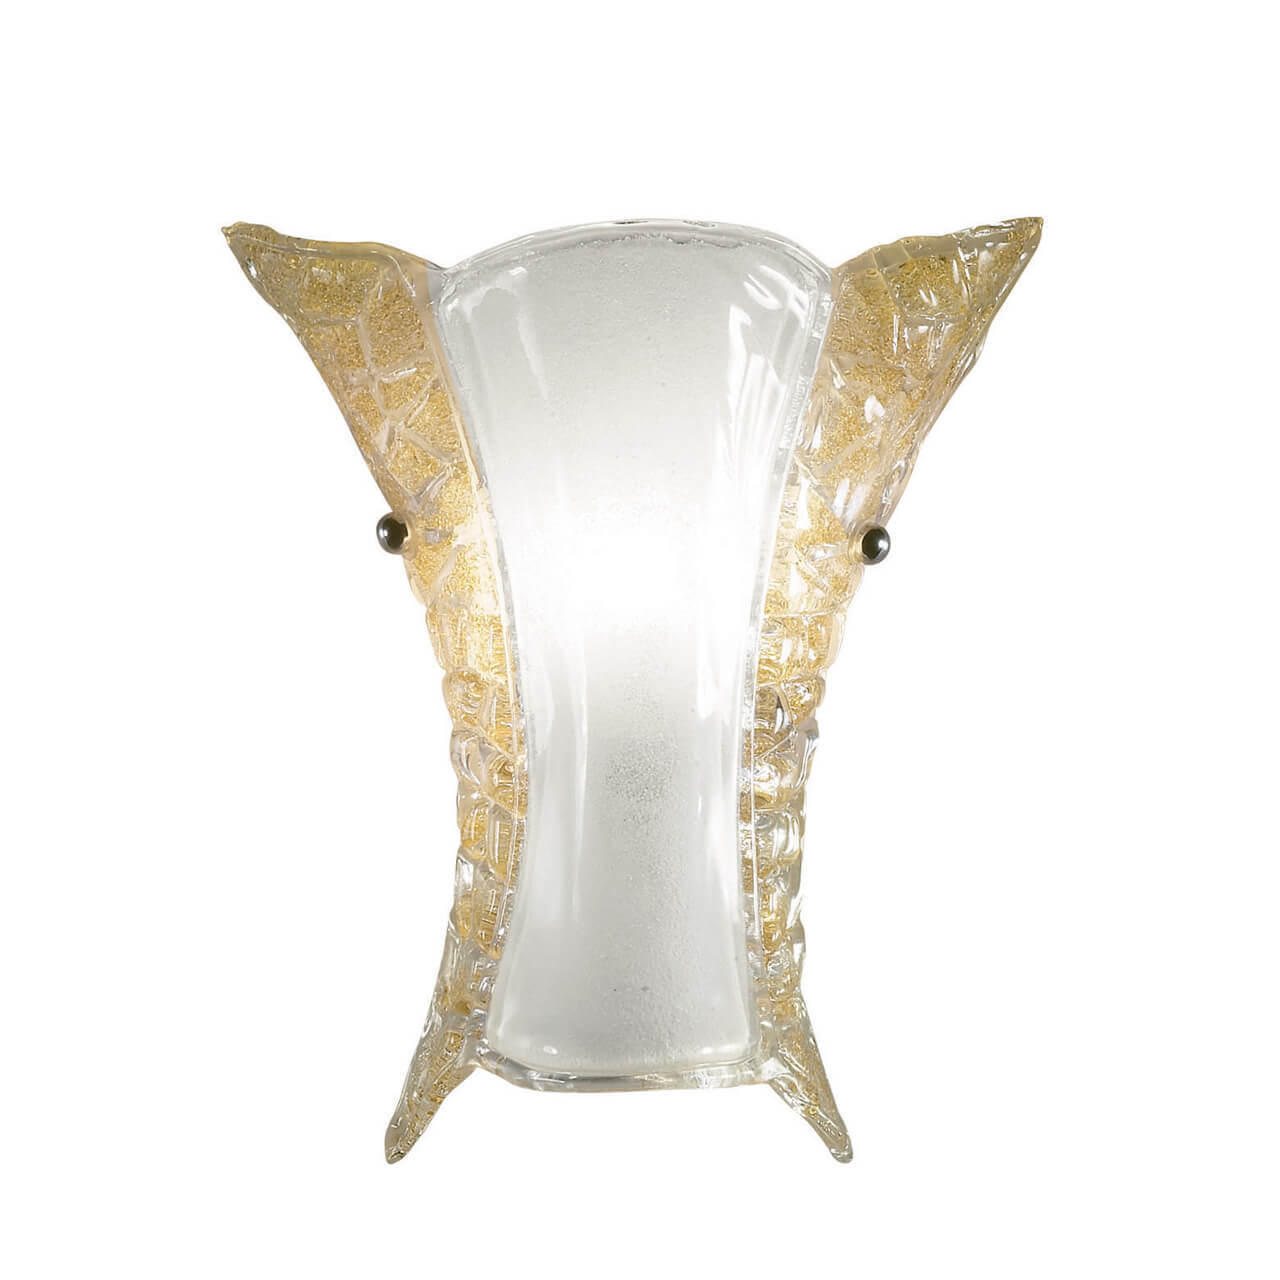 цена на Светильник Ideal Lux Ape AP1 BIg Ape